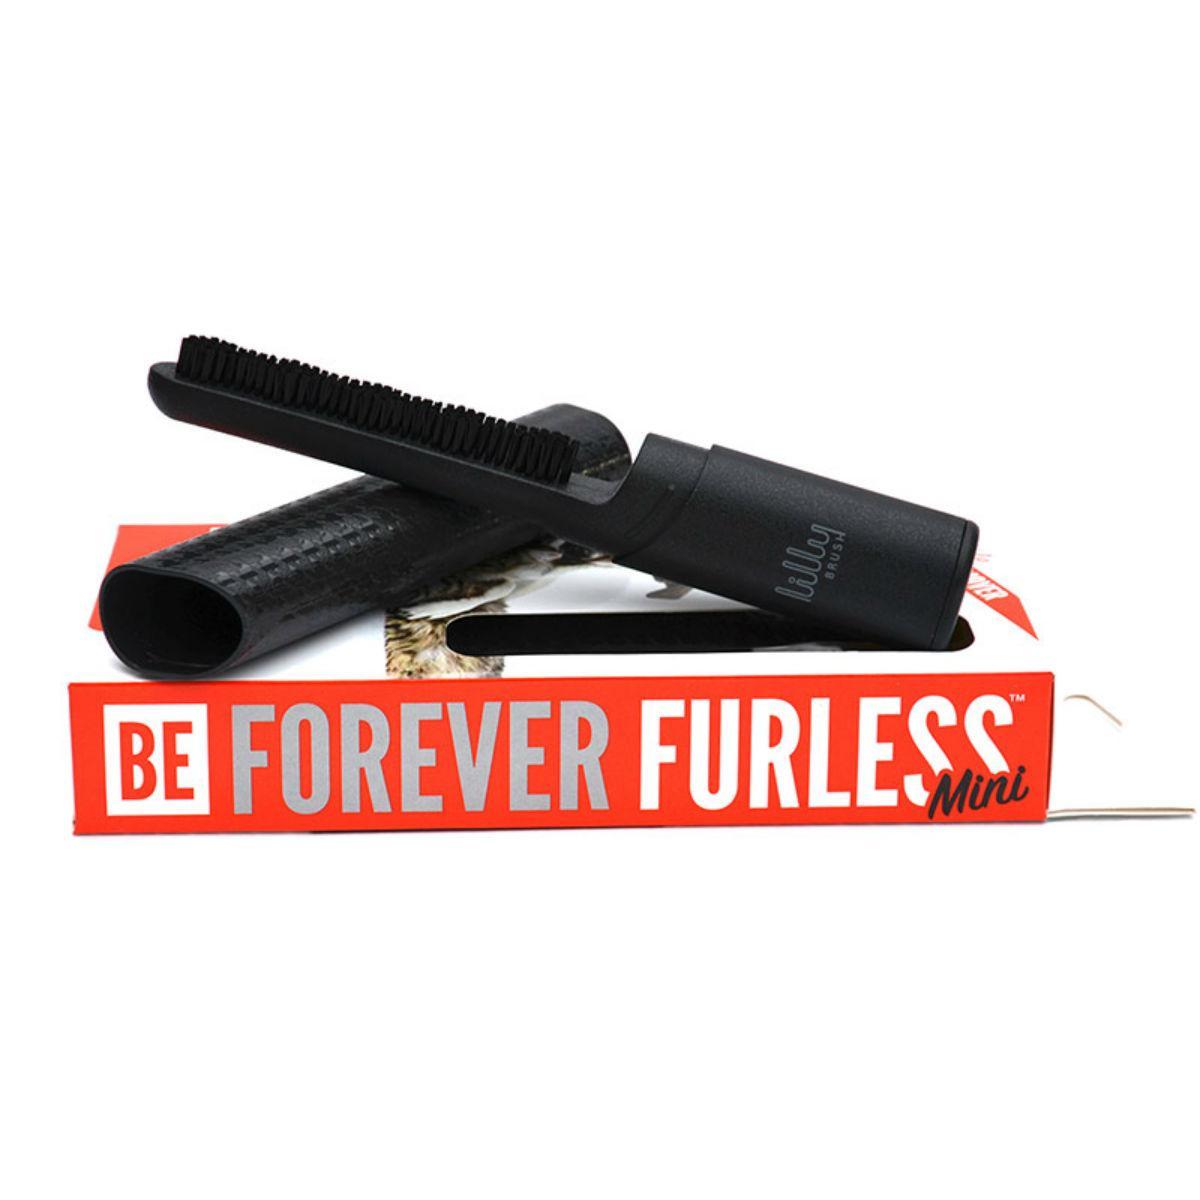 Be Forever Furless Pet Hair Remover Mini - Graphite Gray